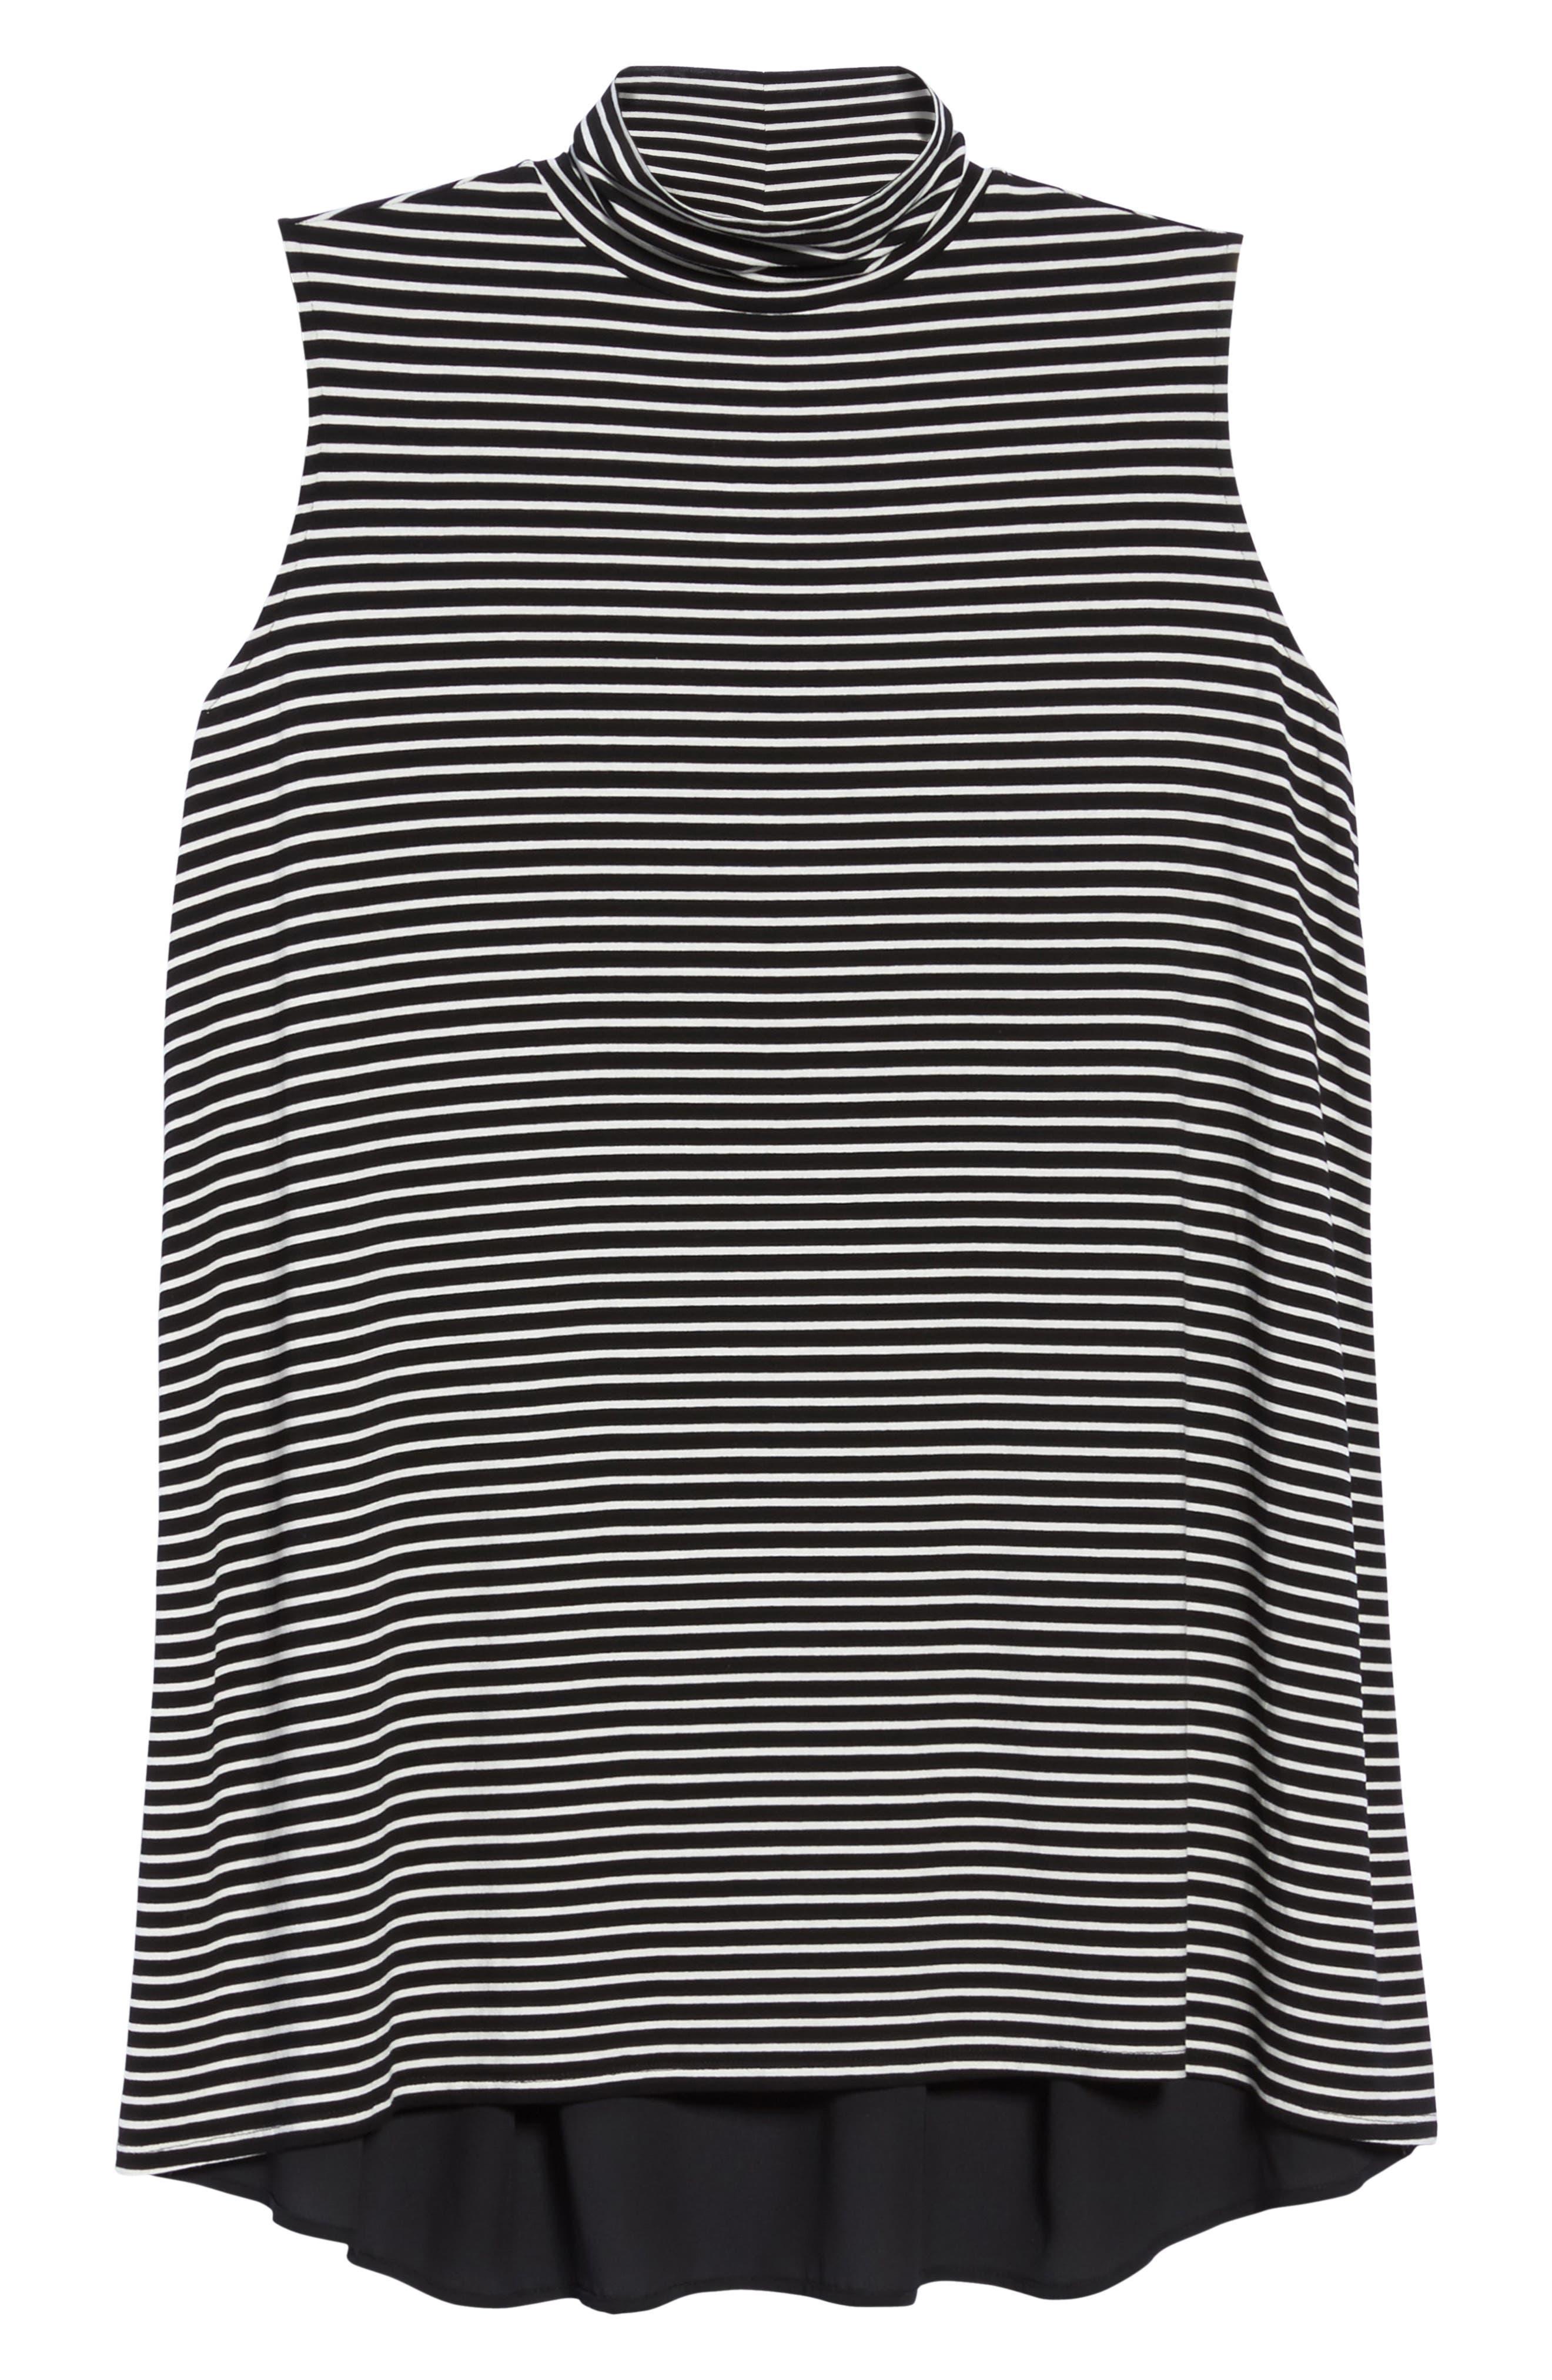 Stripe Mixed Media Turtleneck,                             Alternate thumbnail 6, color,                             Rich Black